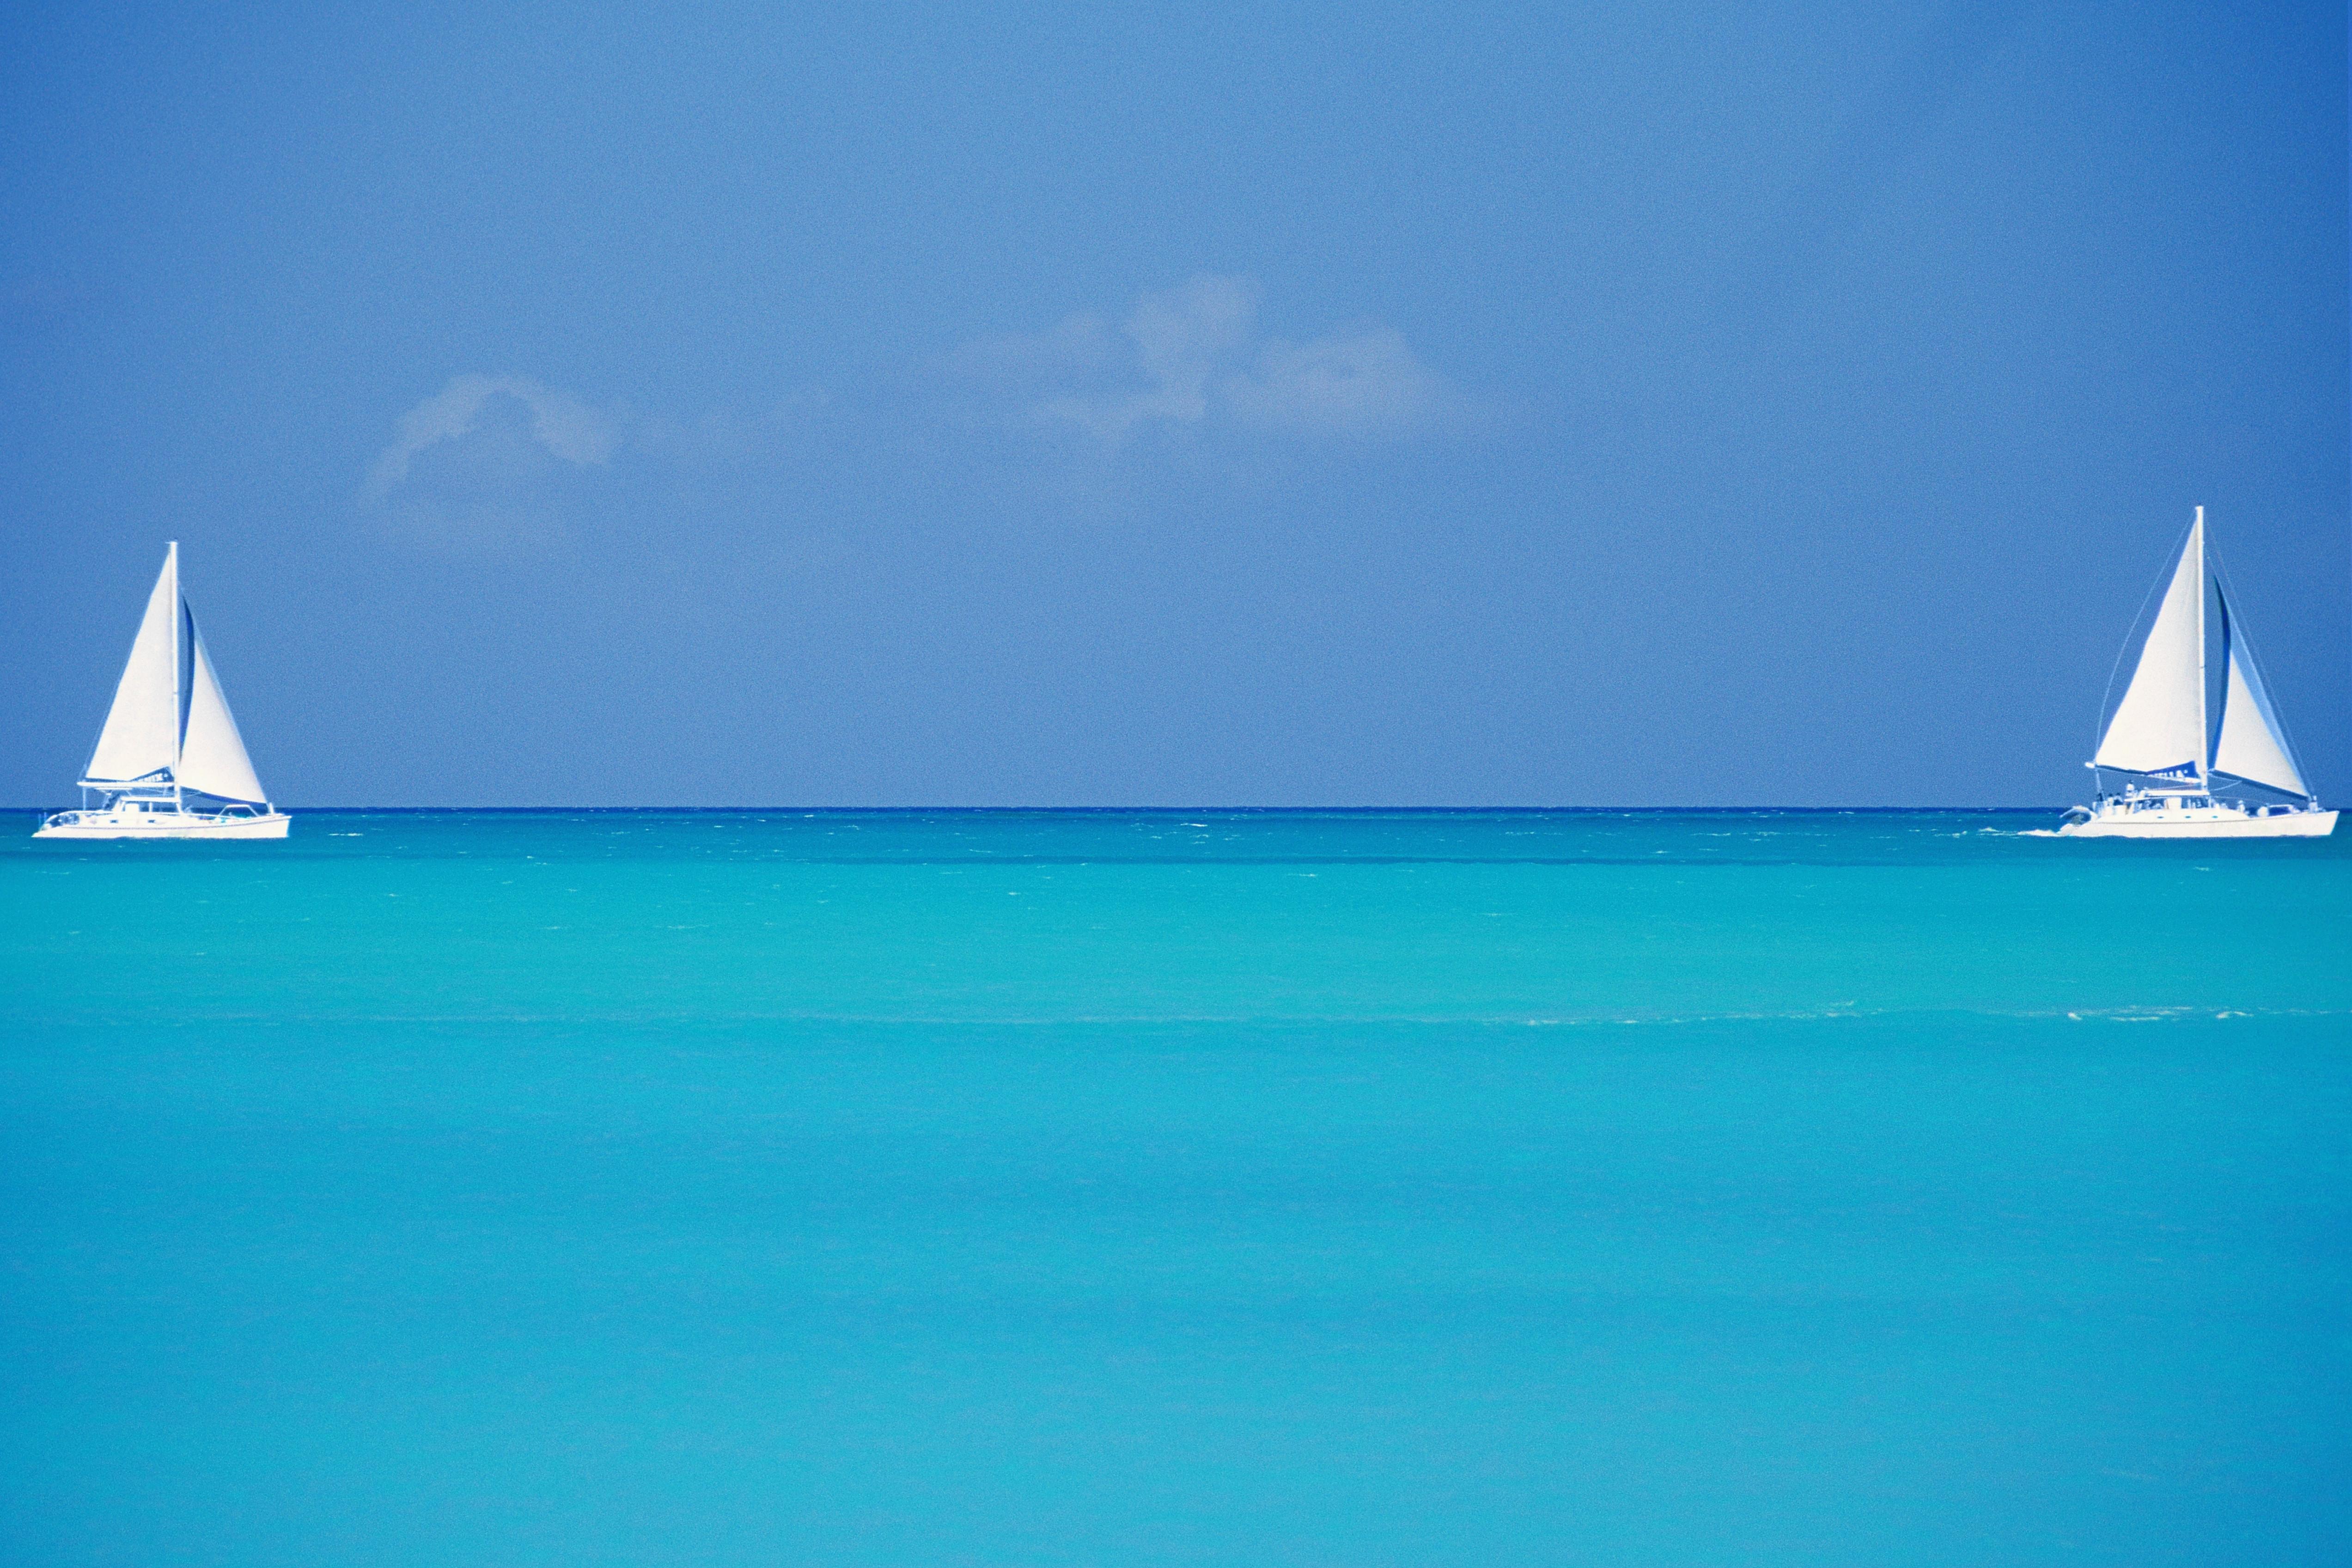 Sailboats, Grace Bay Beach, Turks & Caicos Islands